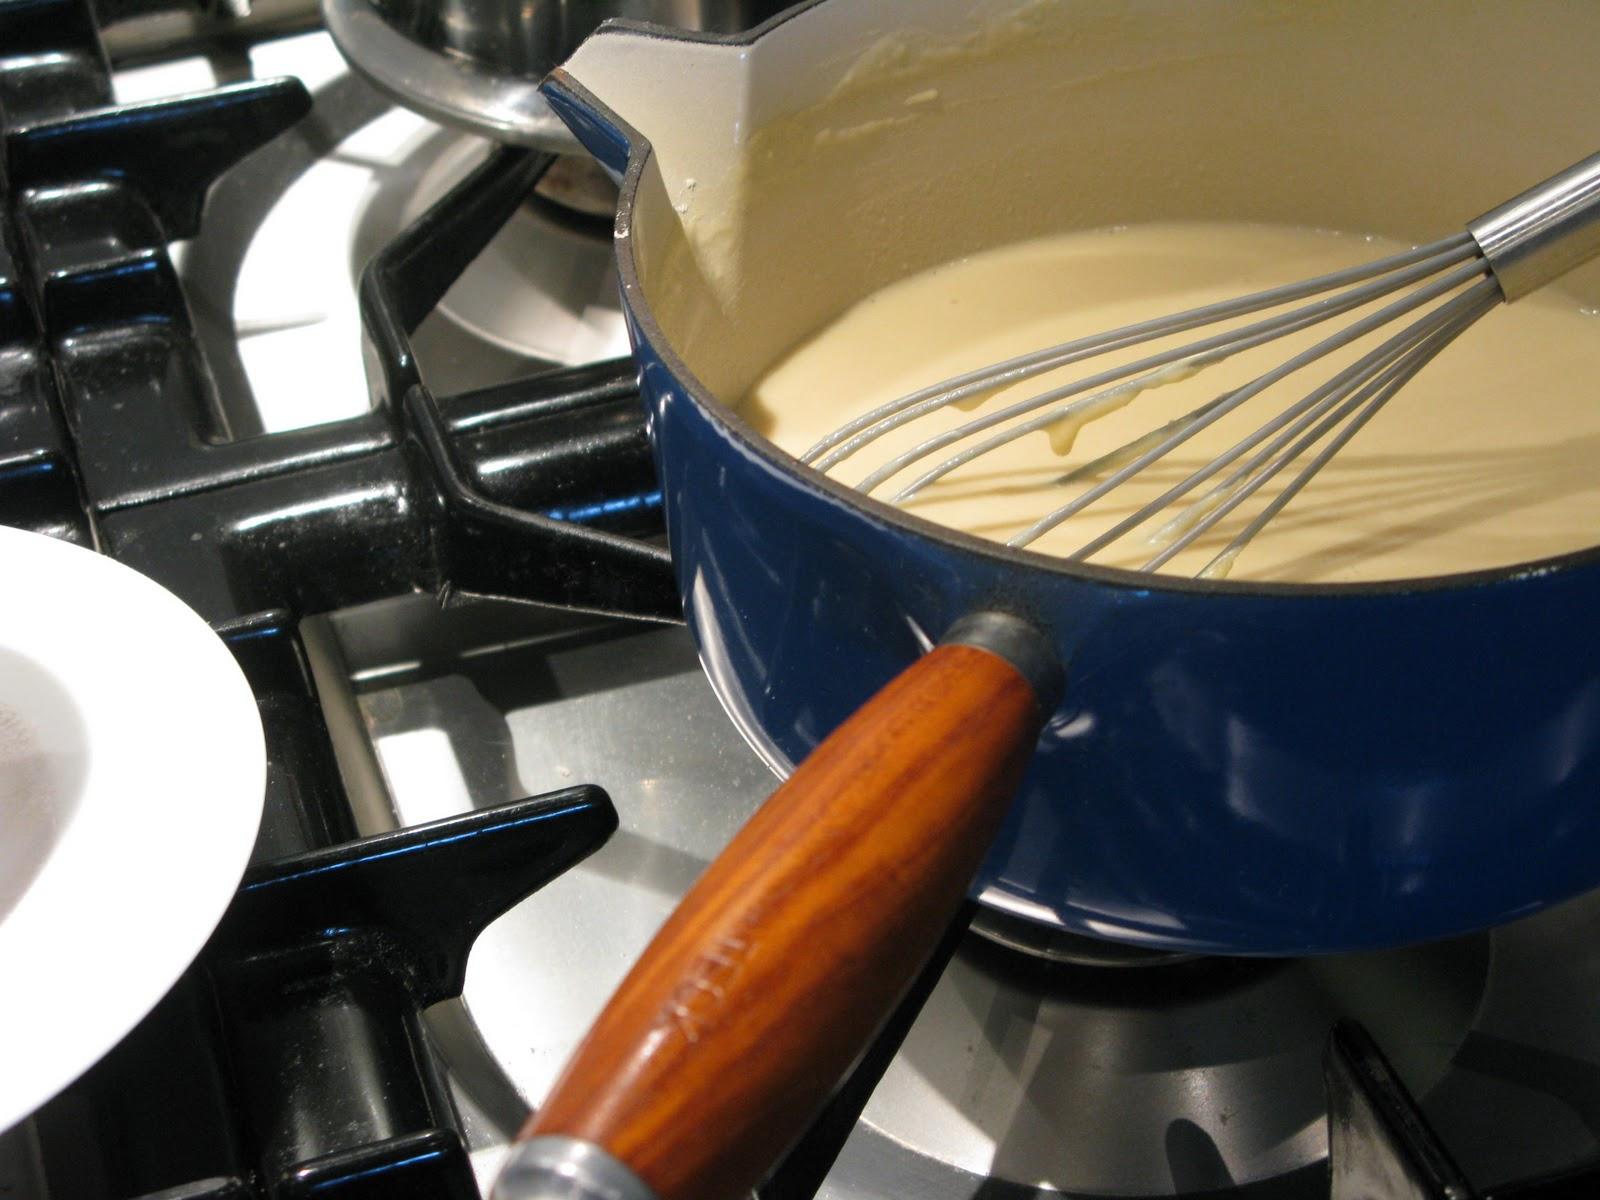 http://1.bp.blogspot.com/_lJ7EiUnMGms/TNeezK1r06I/AAAAAAAAAyo/OqhVk0pIwhg/s1600/Porcini+lasagne+2+002.jpg